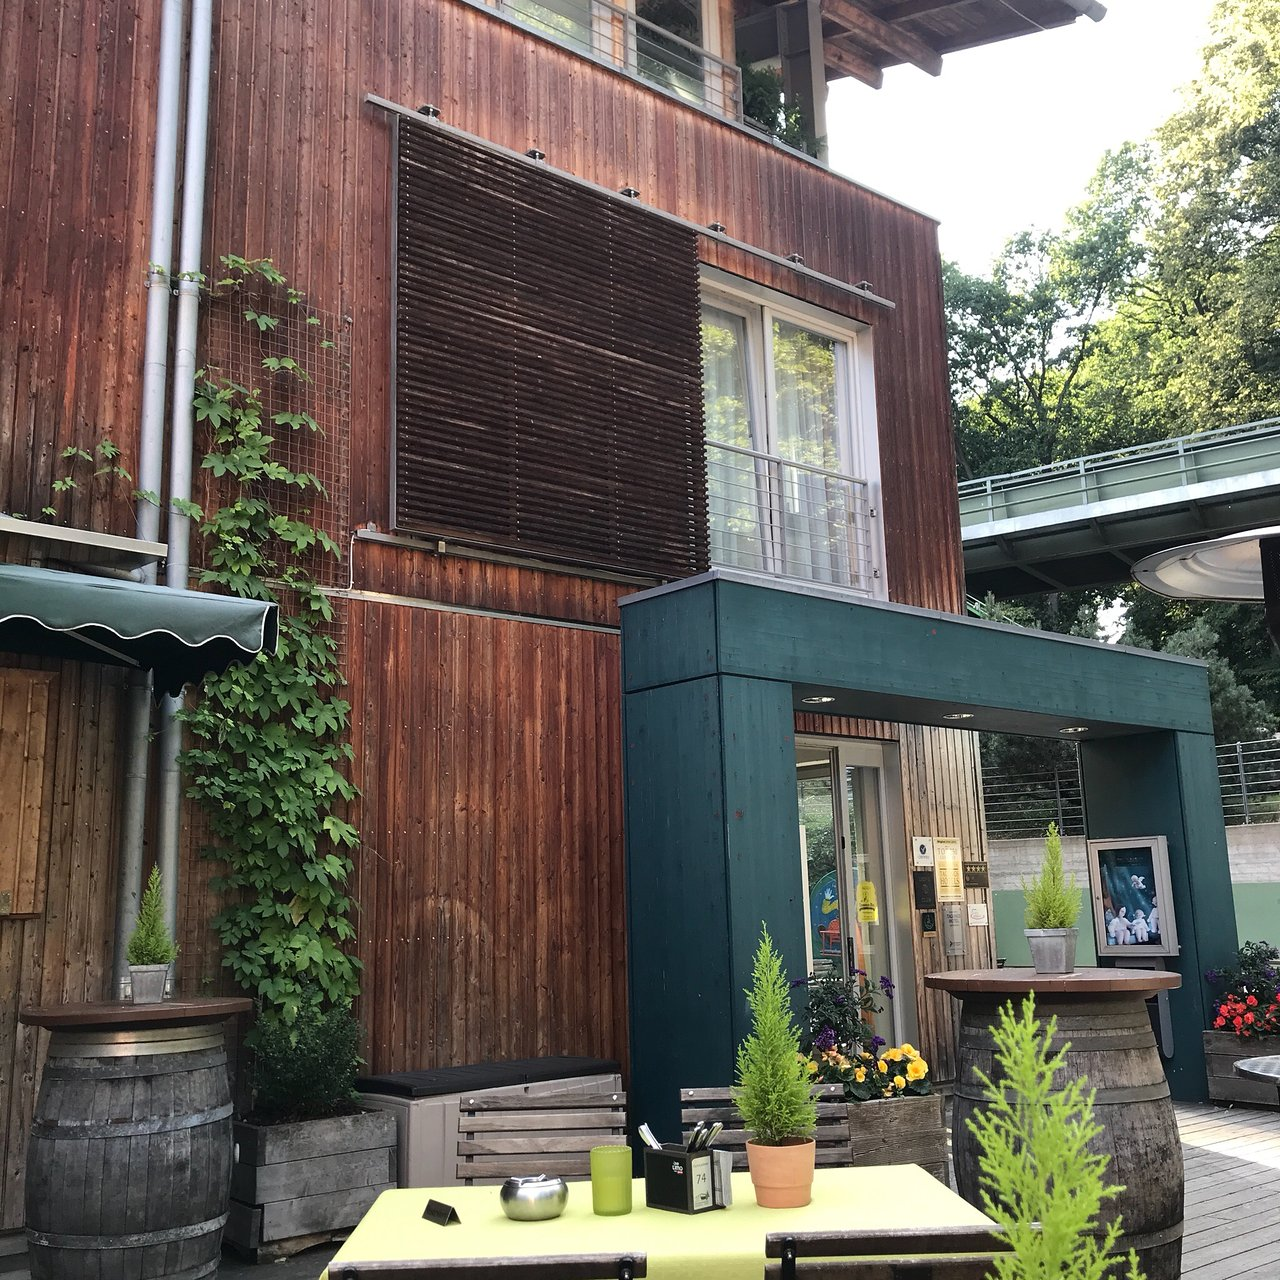 forsthaus gruena 100 1 1 0 prices hotel reviews chemnitz rh tripadvisor com